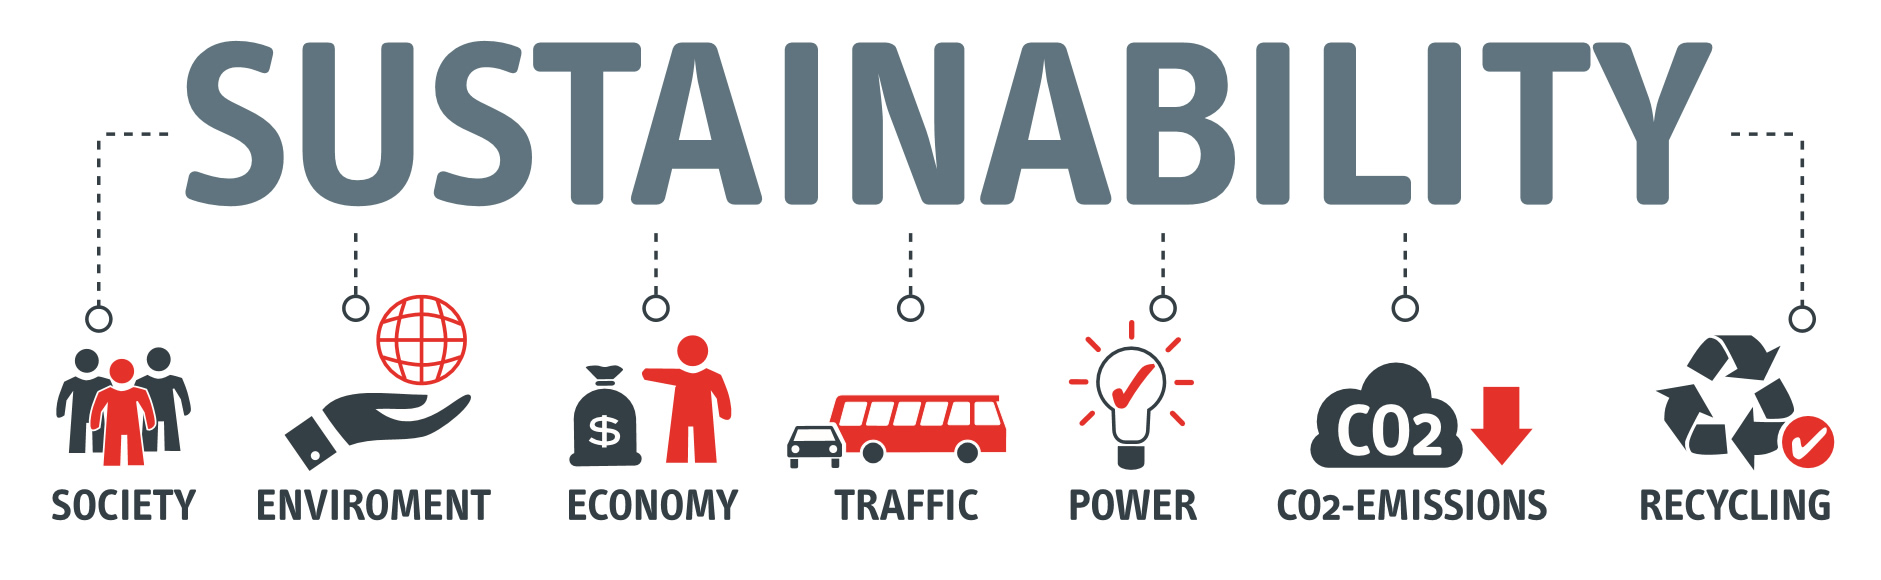 Sustainability-banner-8